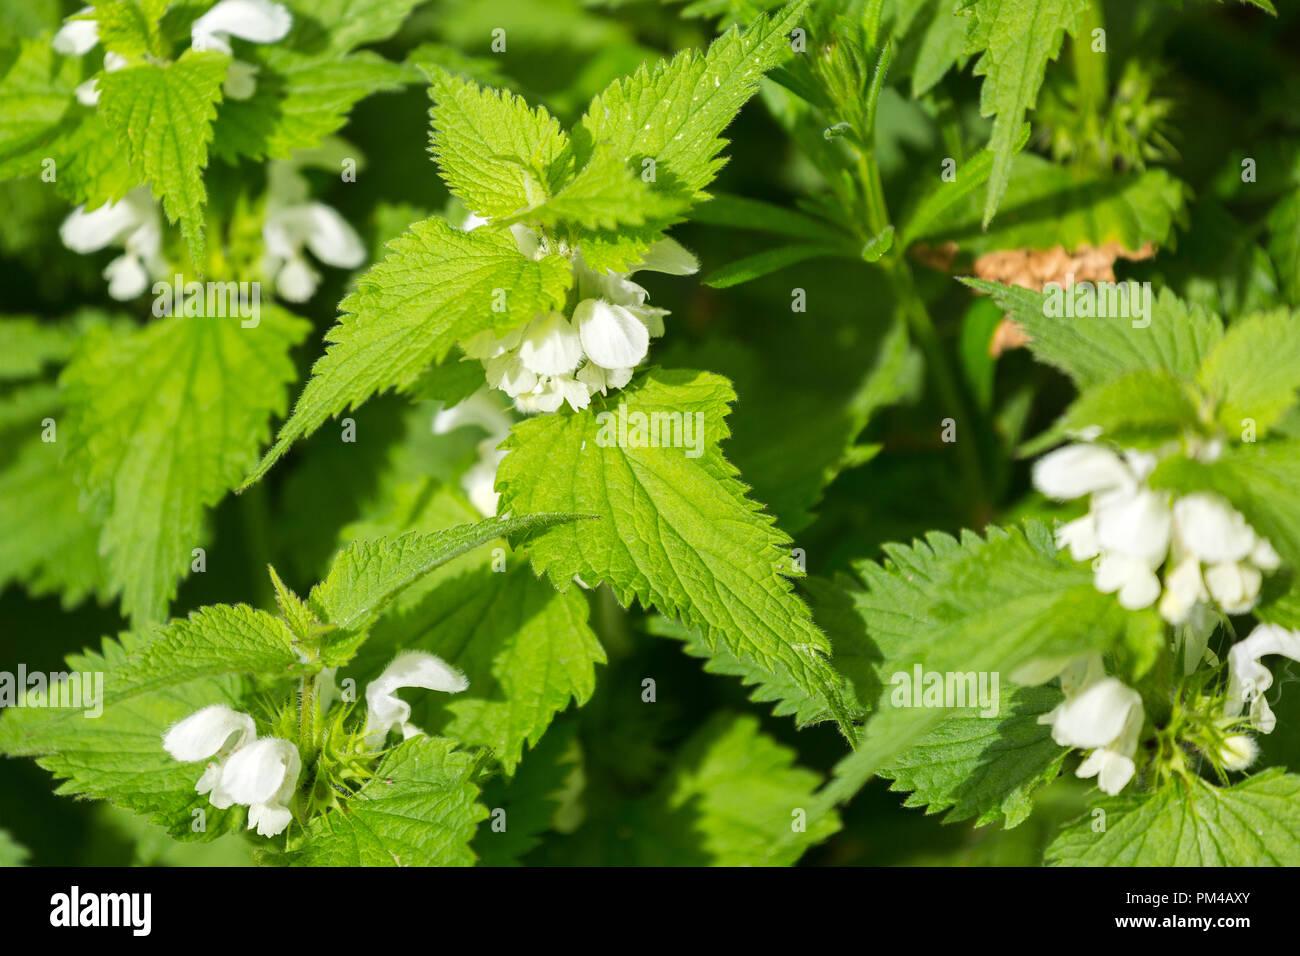 close up of Lamium album White Nettles flowers - Stock Image